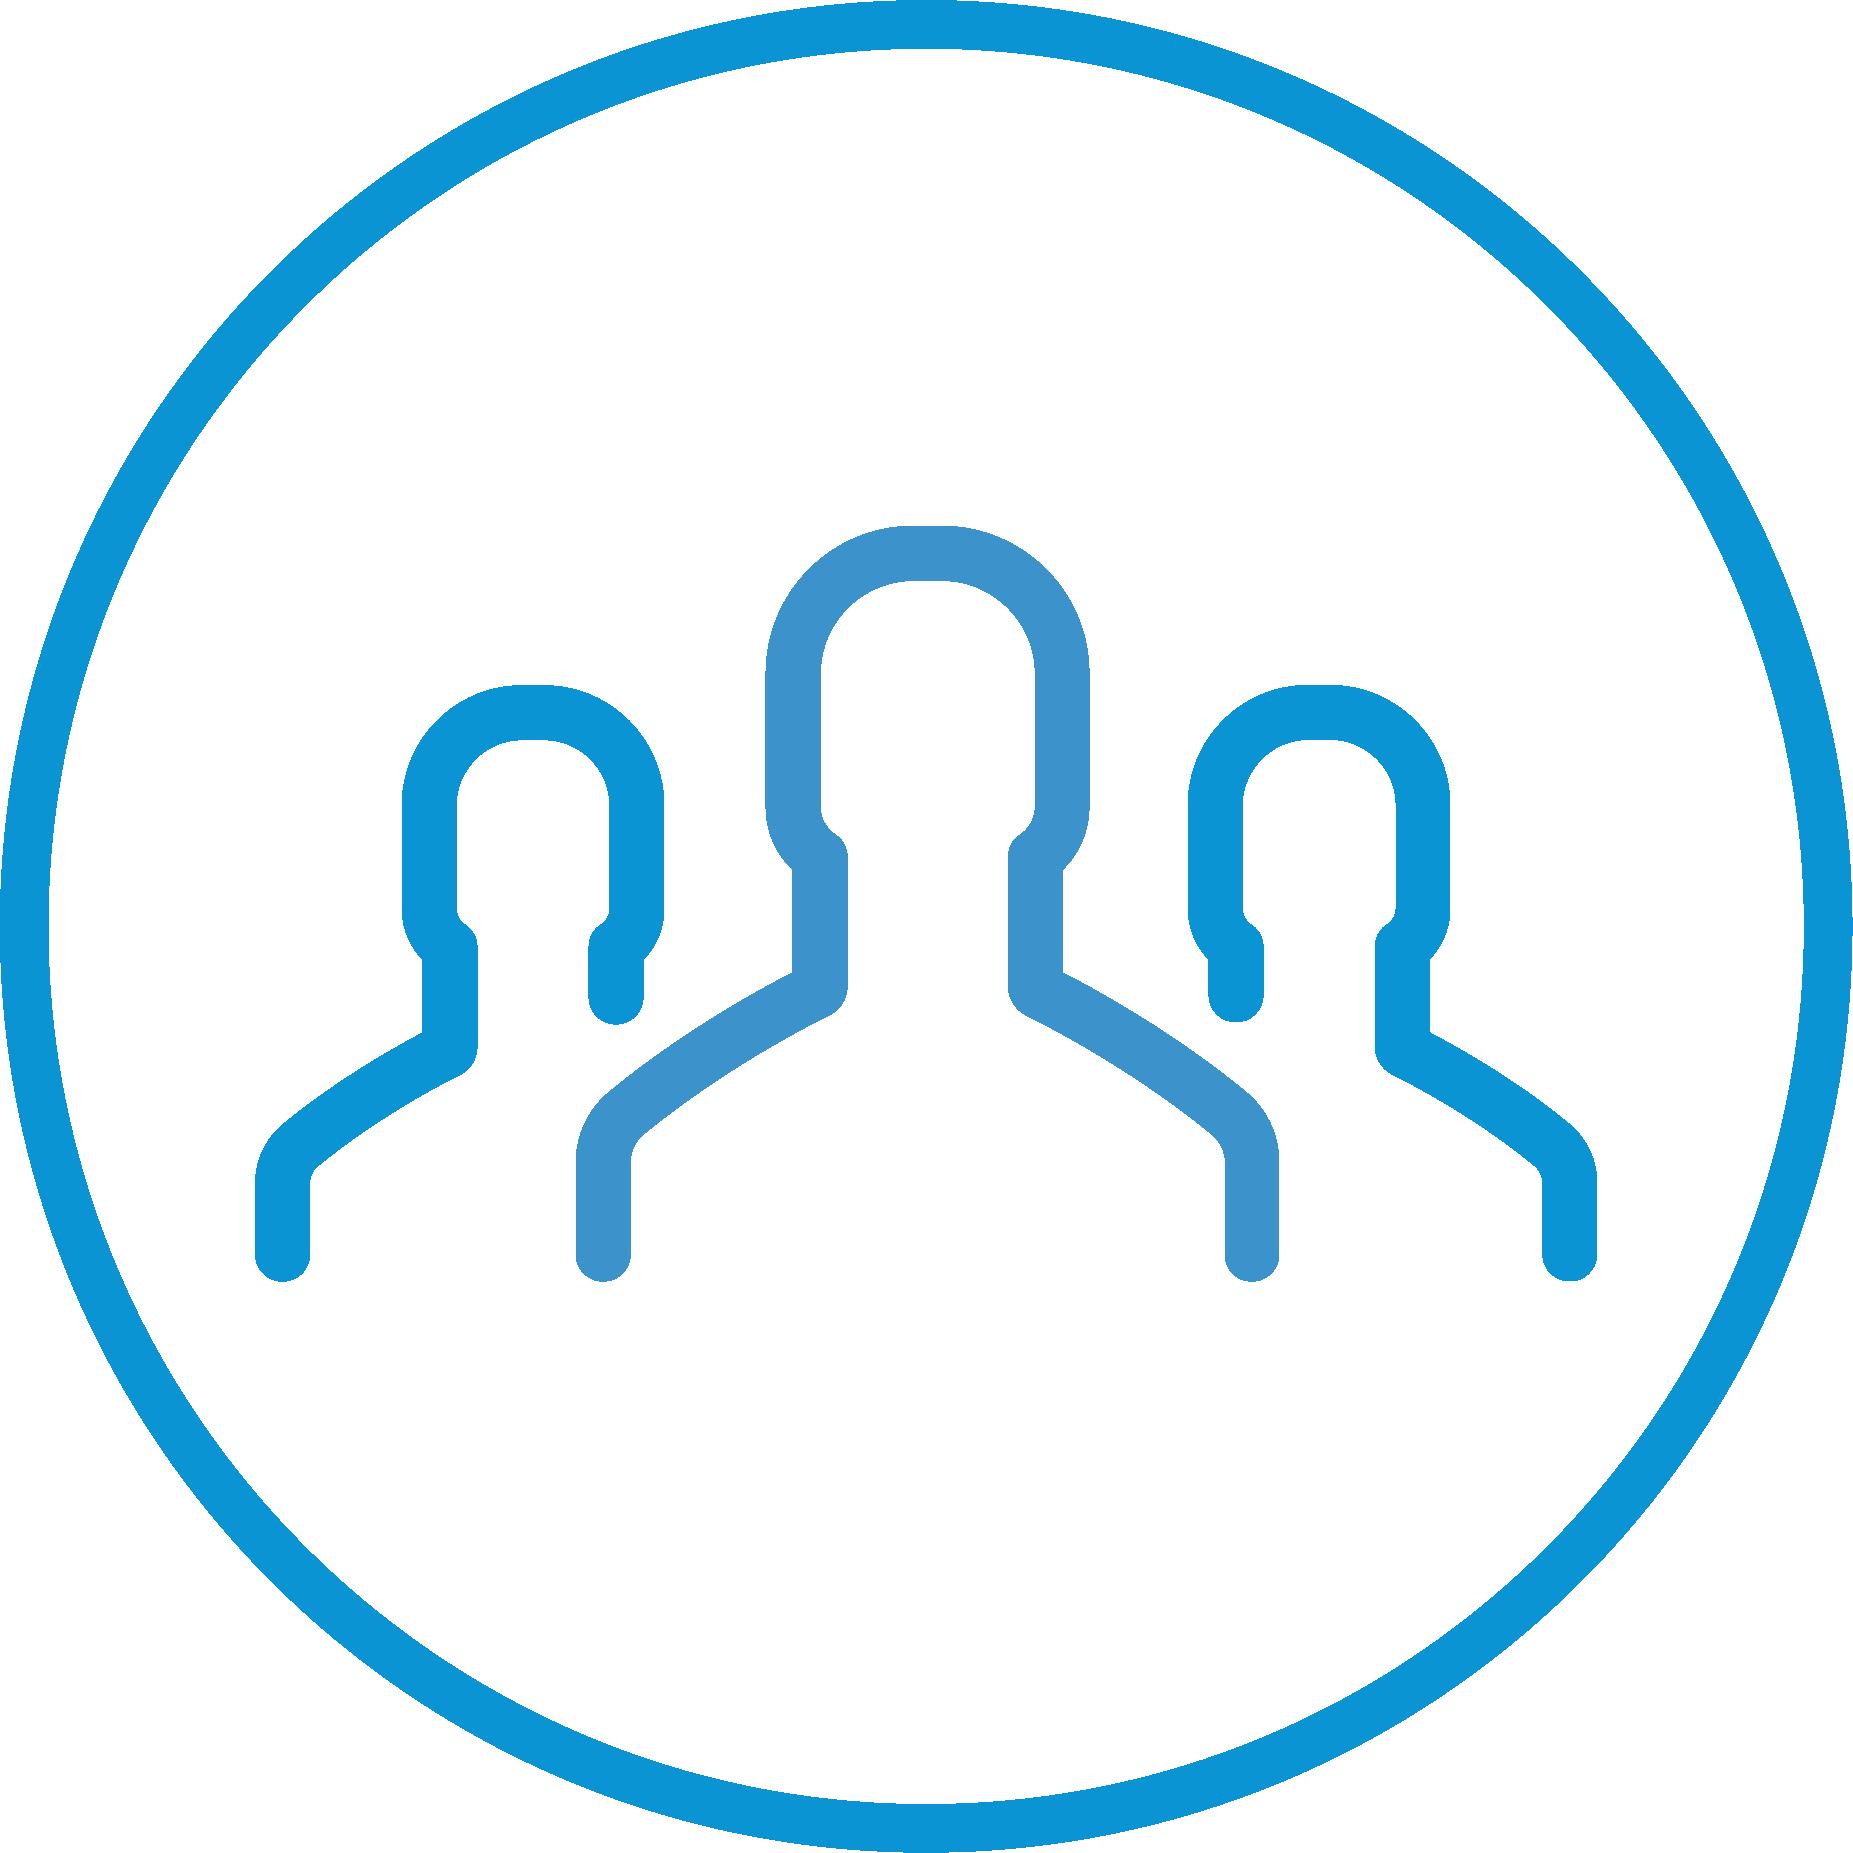 icone-membres-entreprendre-portugal • Entreprendre.pt